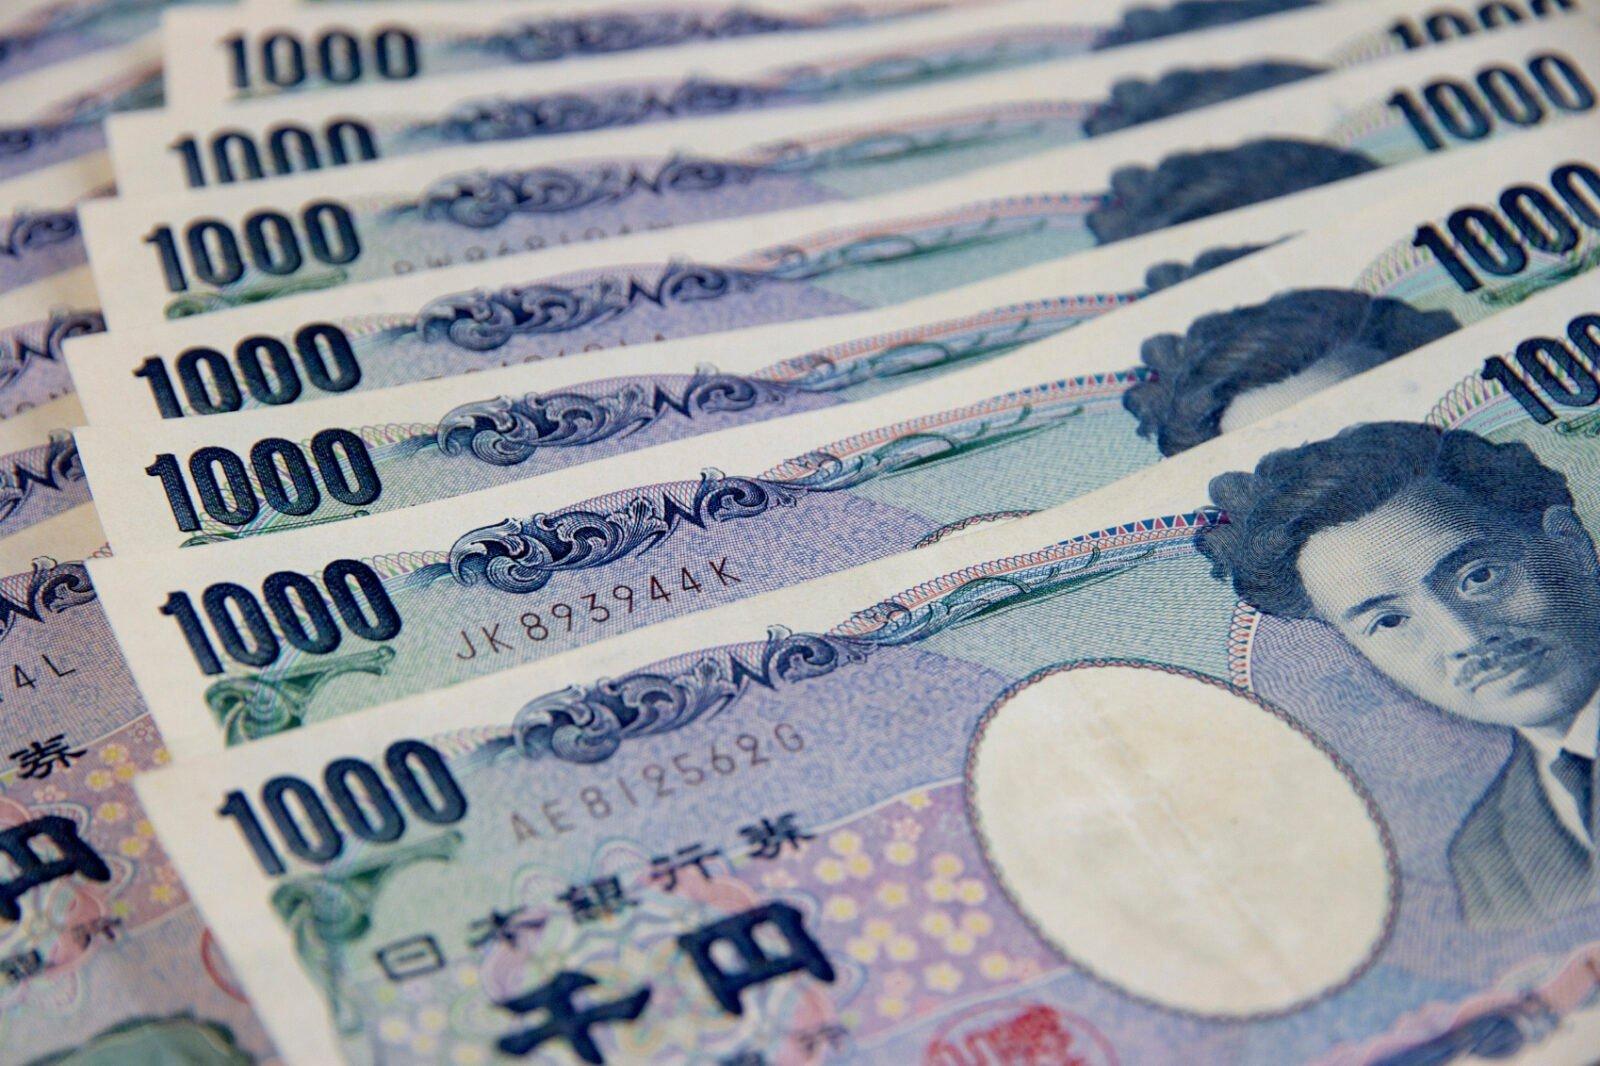 Japanese 1000 yen notes